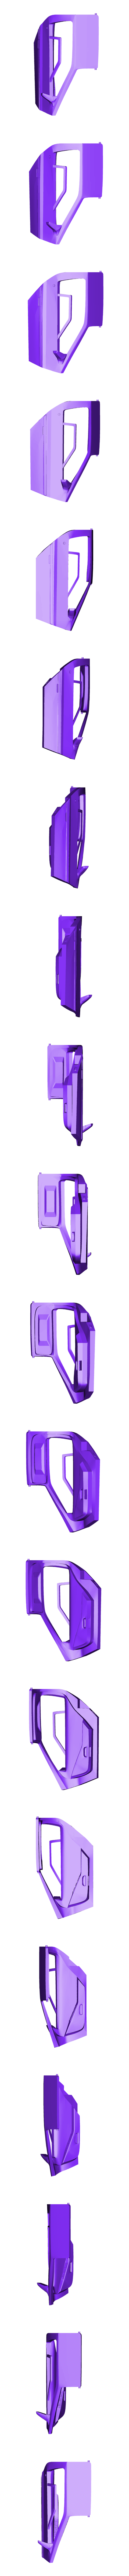 door_right.stl Download free STL file DIY DeLorean Time Machine with lights!! • 3D printer model, OneIdMONstr